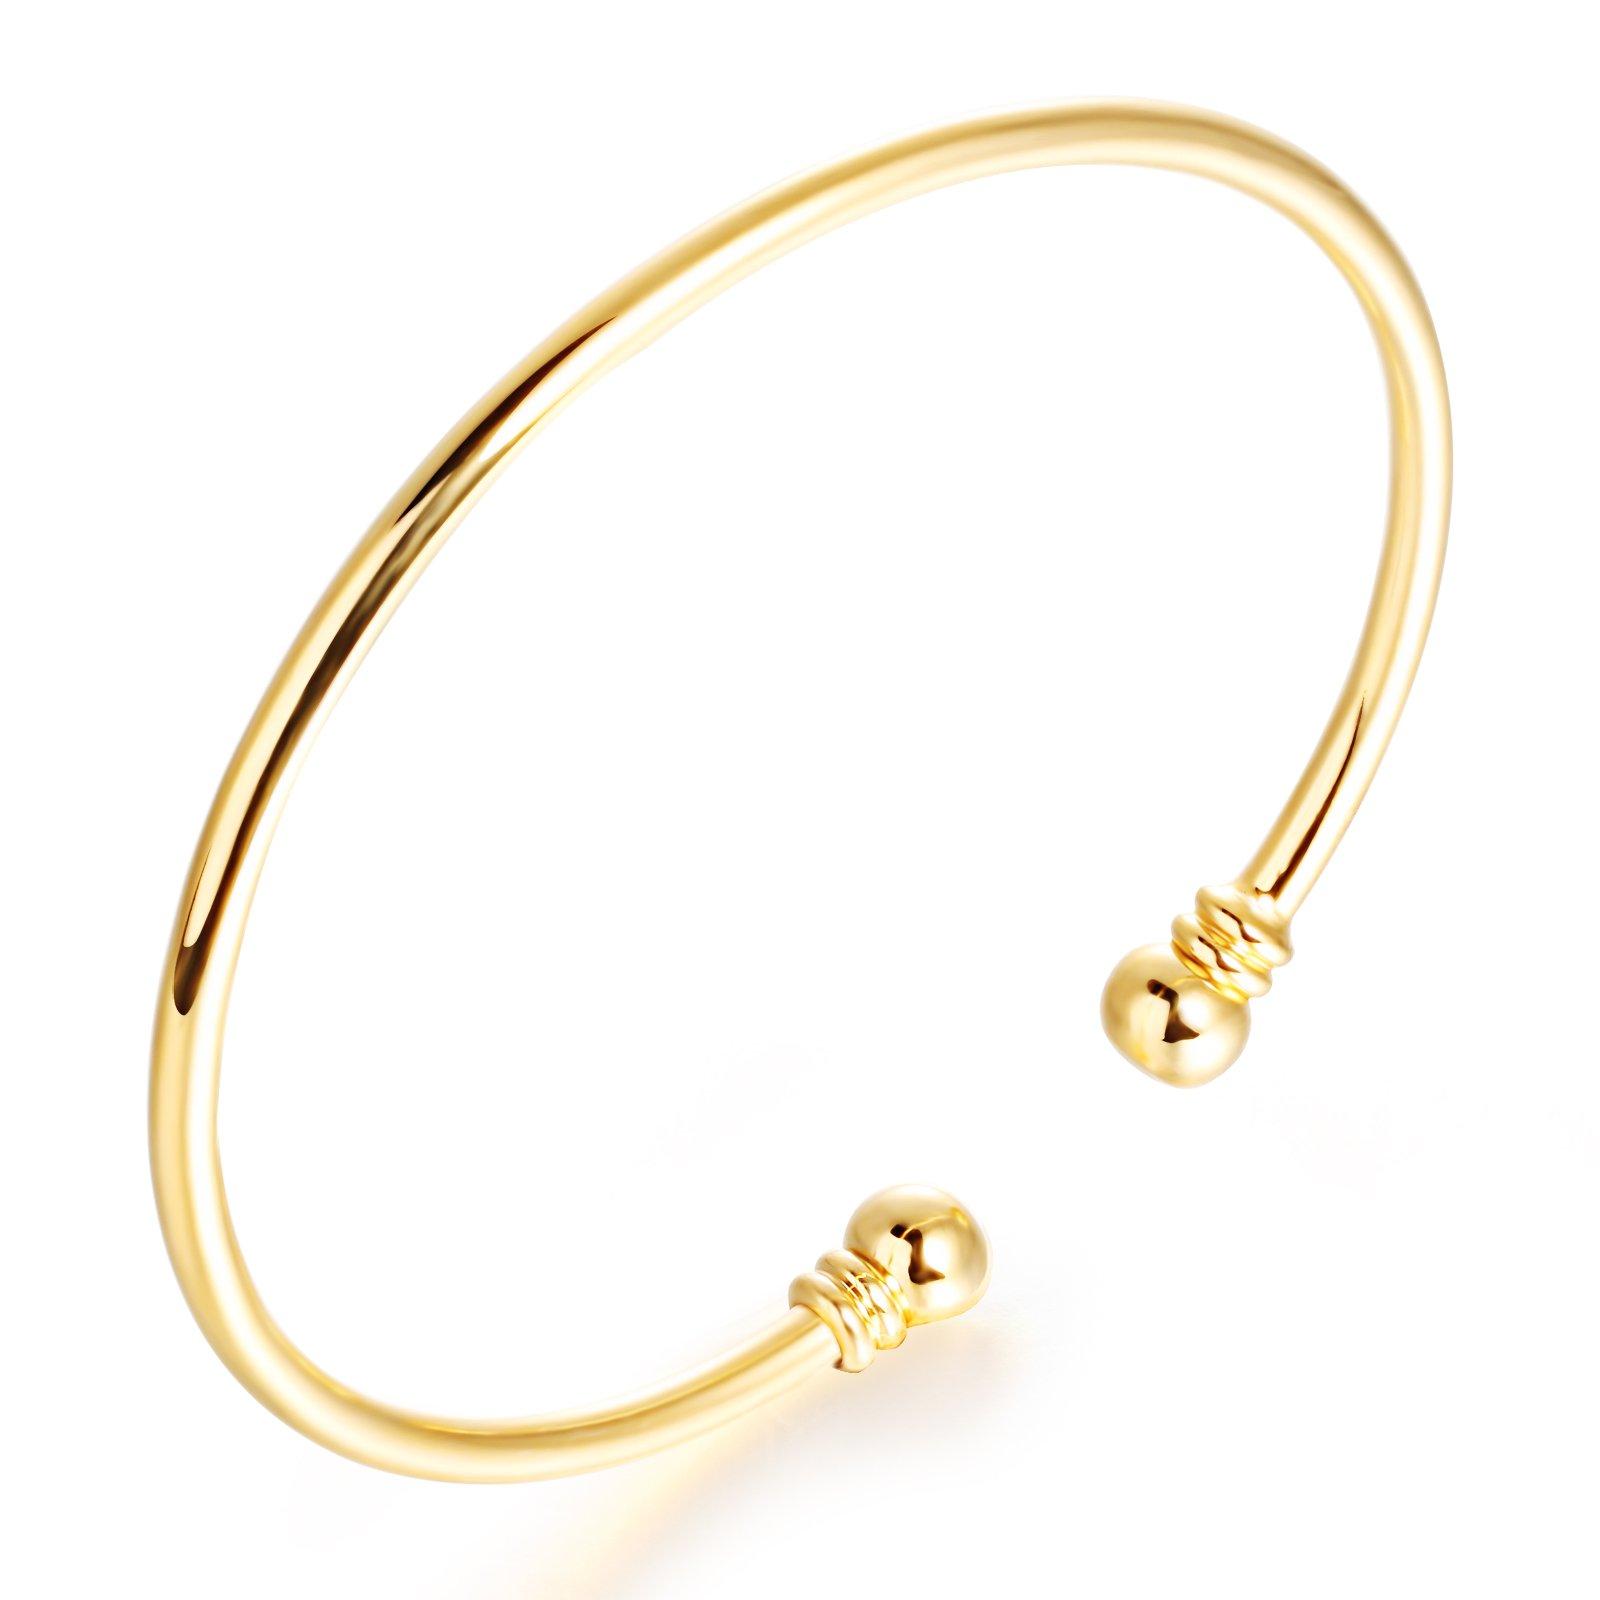 Style 01-08. WINNICACA Mens Copper Cuff Bracelet Dainty Two-Tone Bangle Bracelet for Teen Girls Women for Anniversary